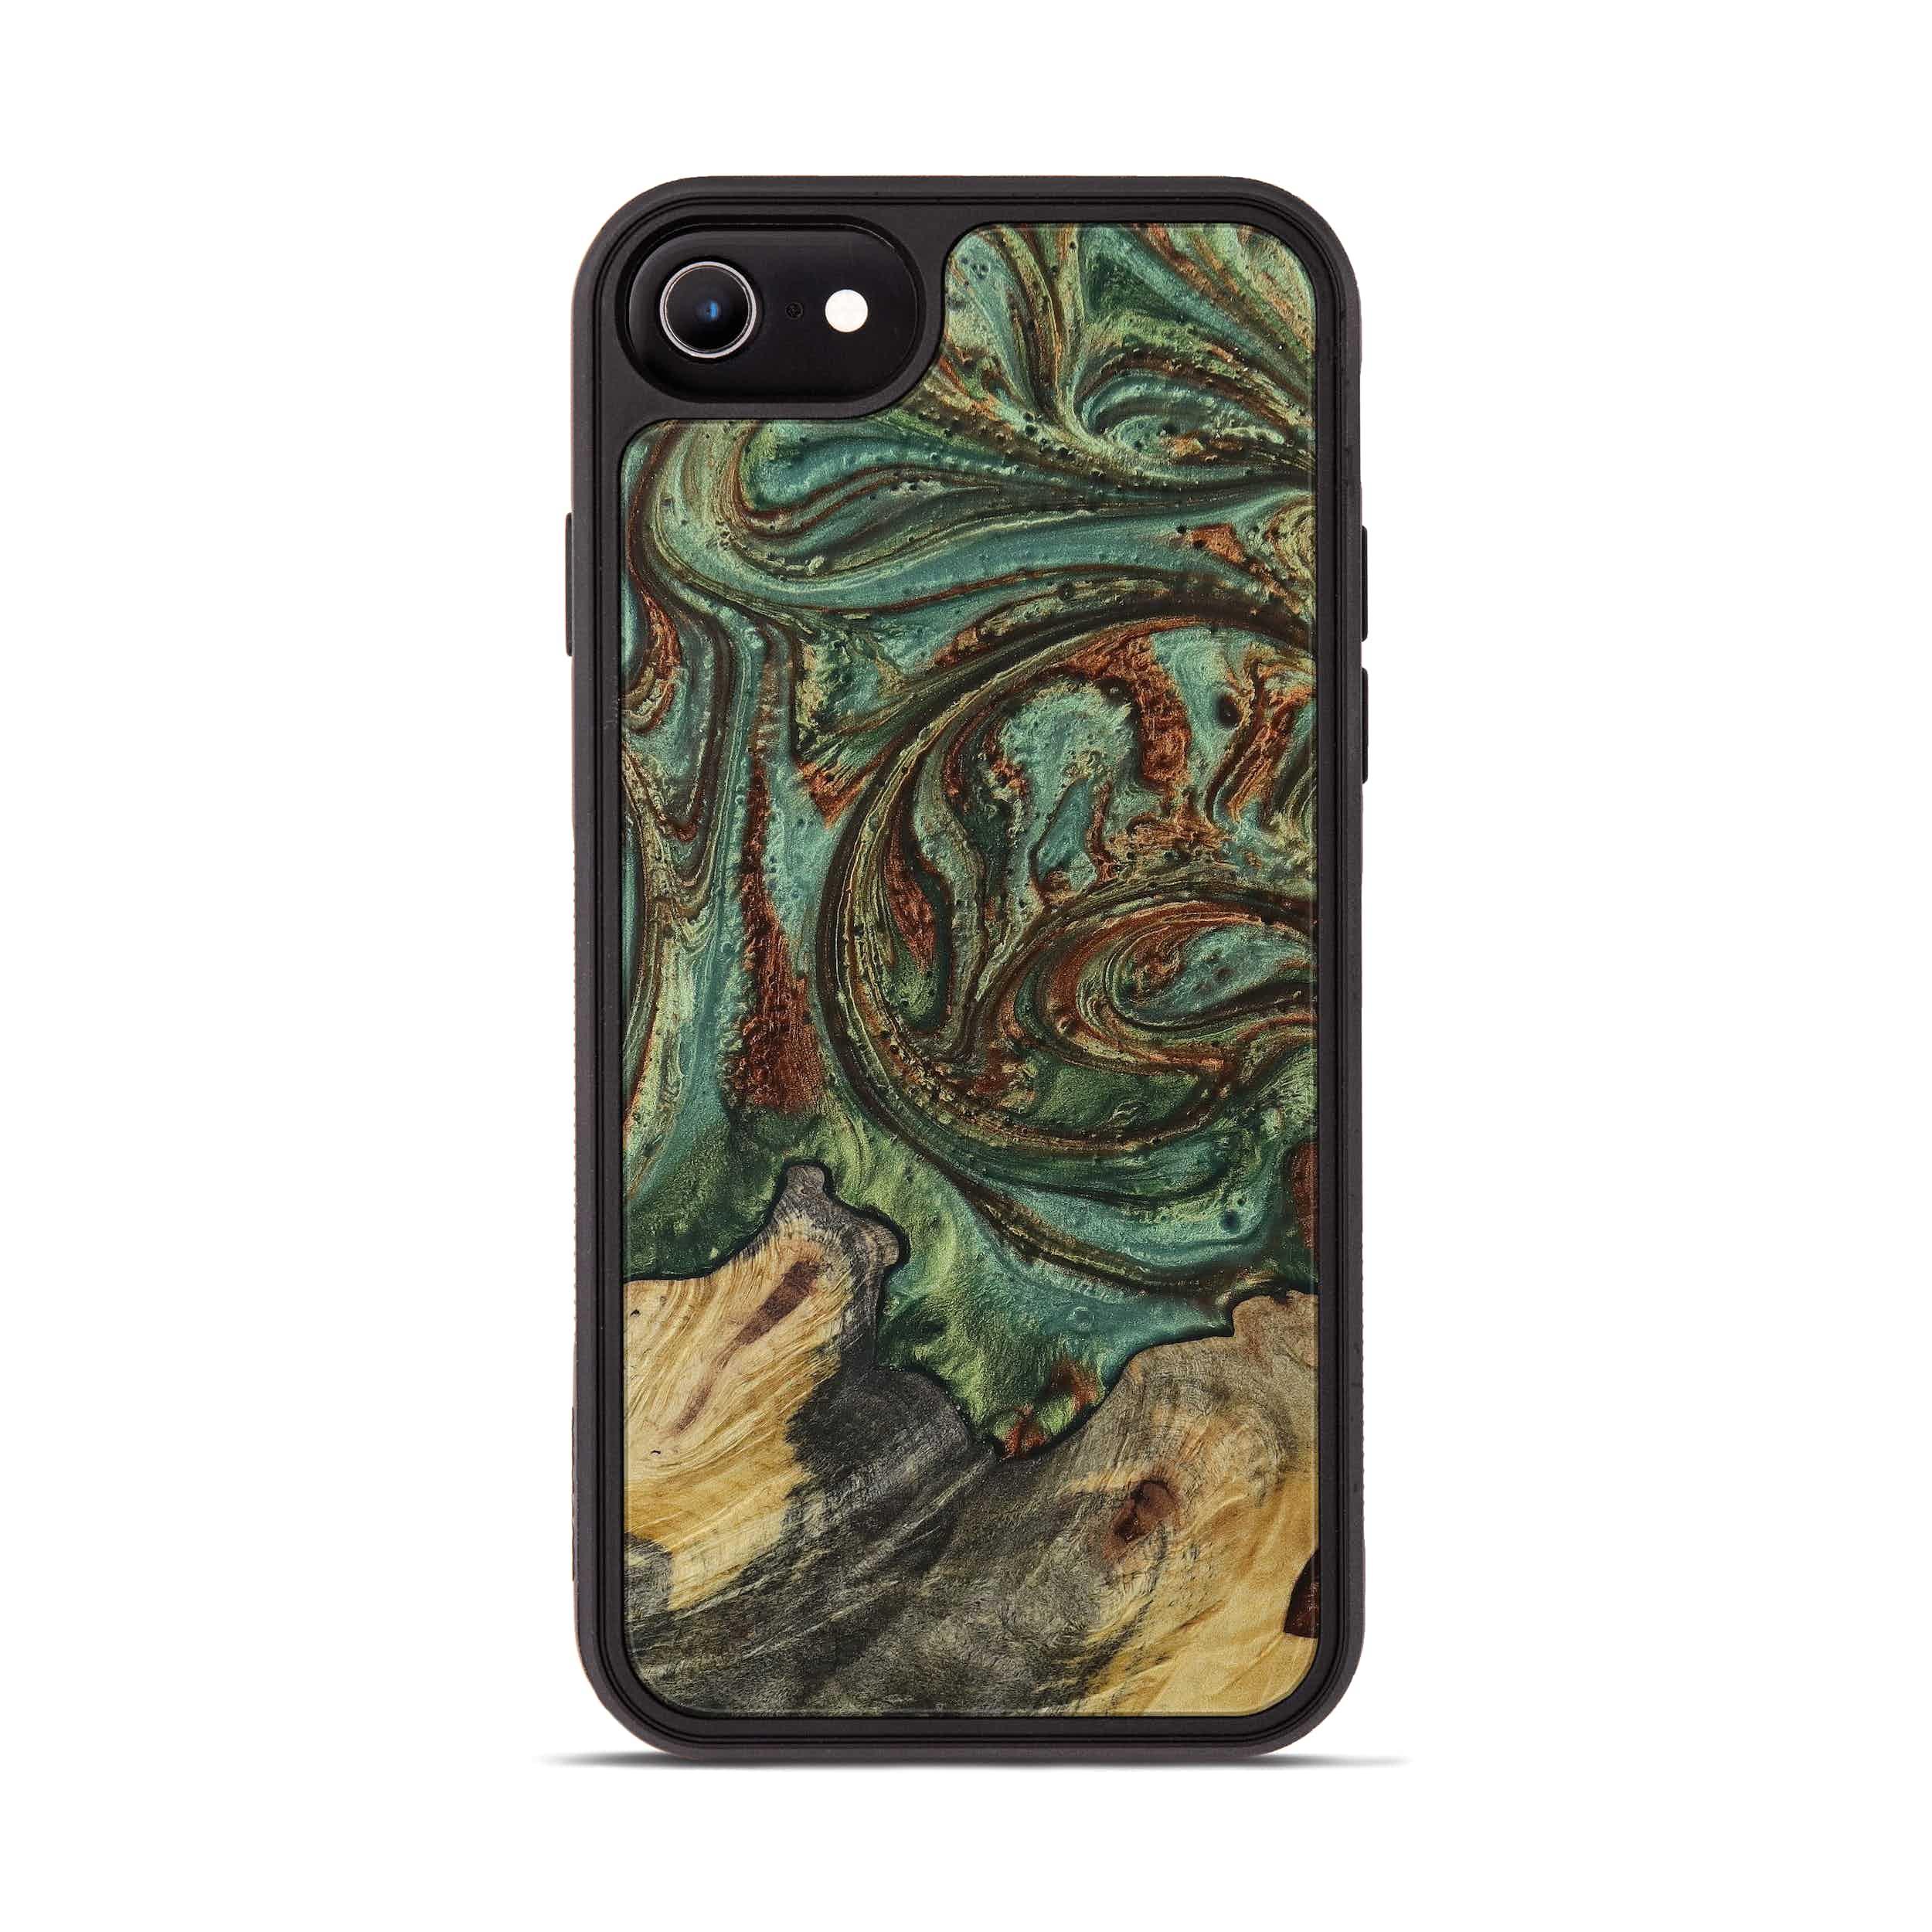 iPhone 6s Wood+Resin Phone Case - Reyna (Dark Green, 397860)